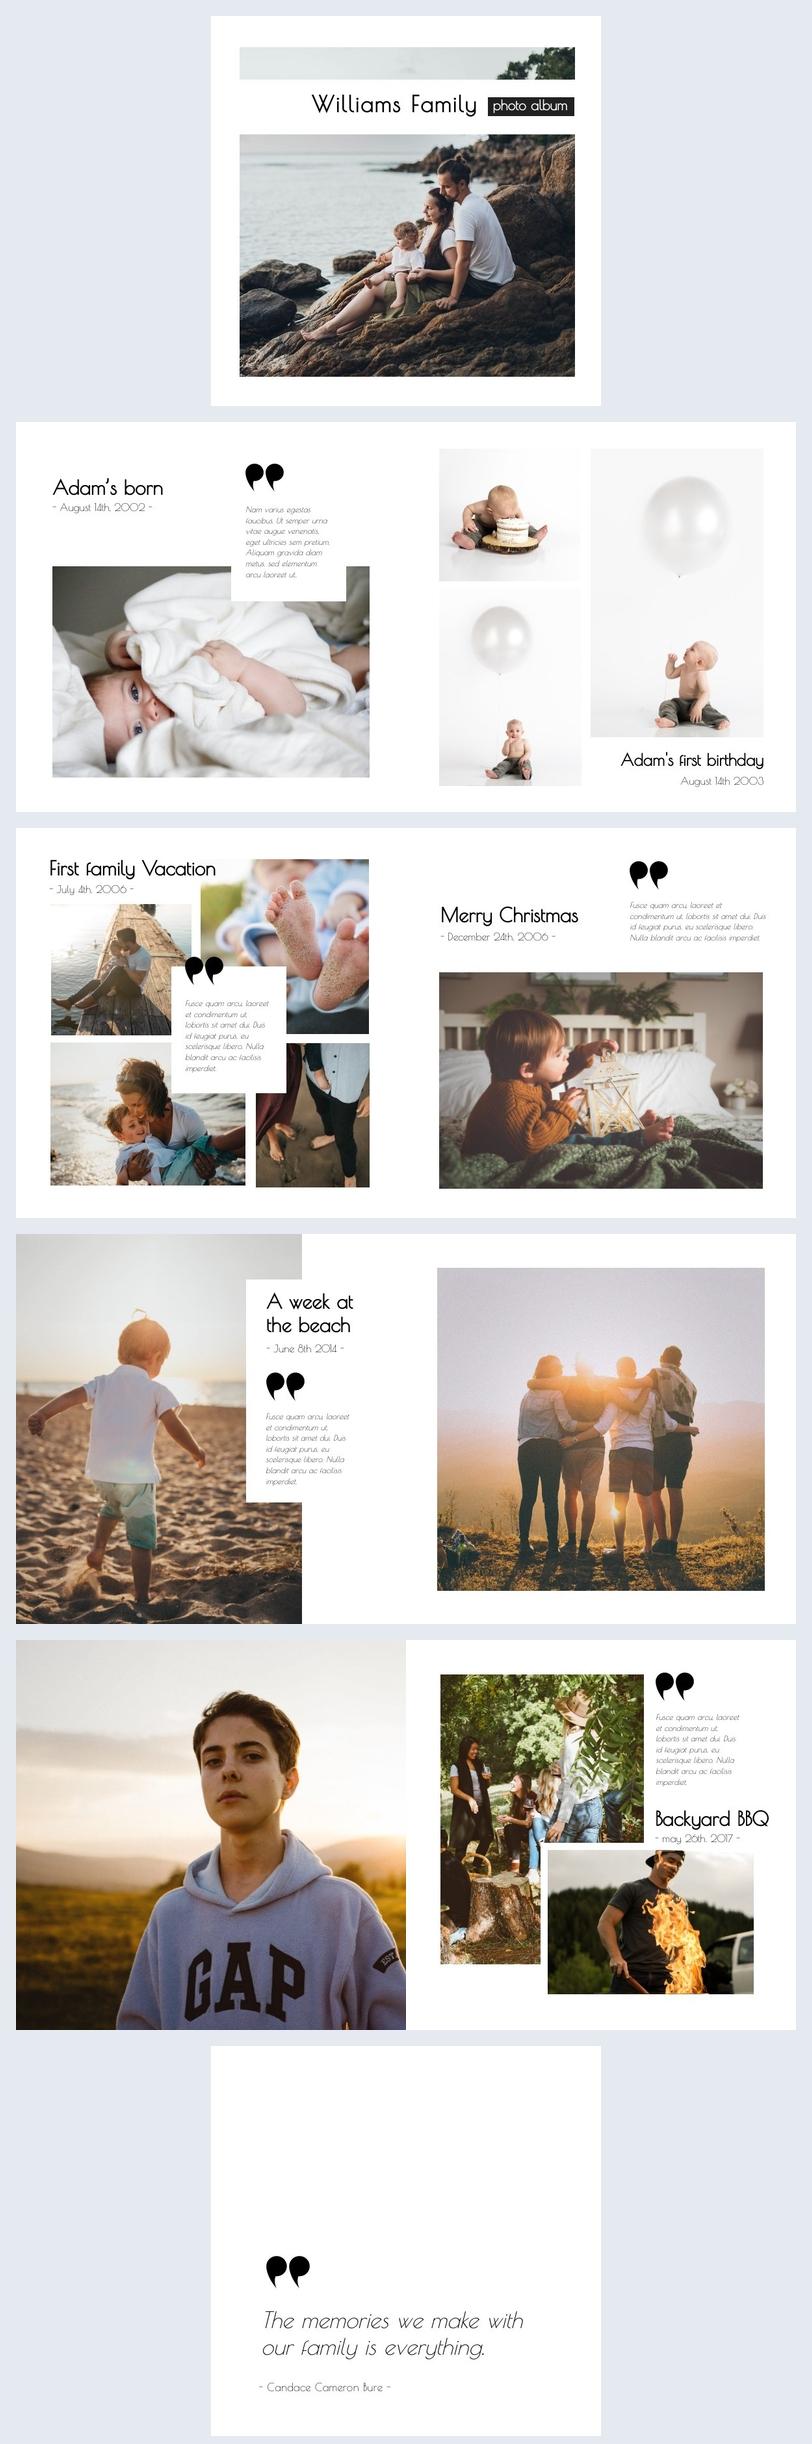 Online Family Photo Album Template Example